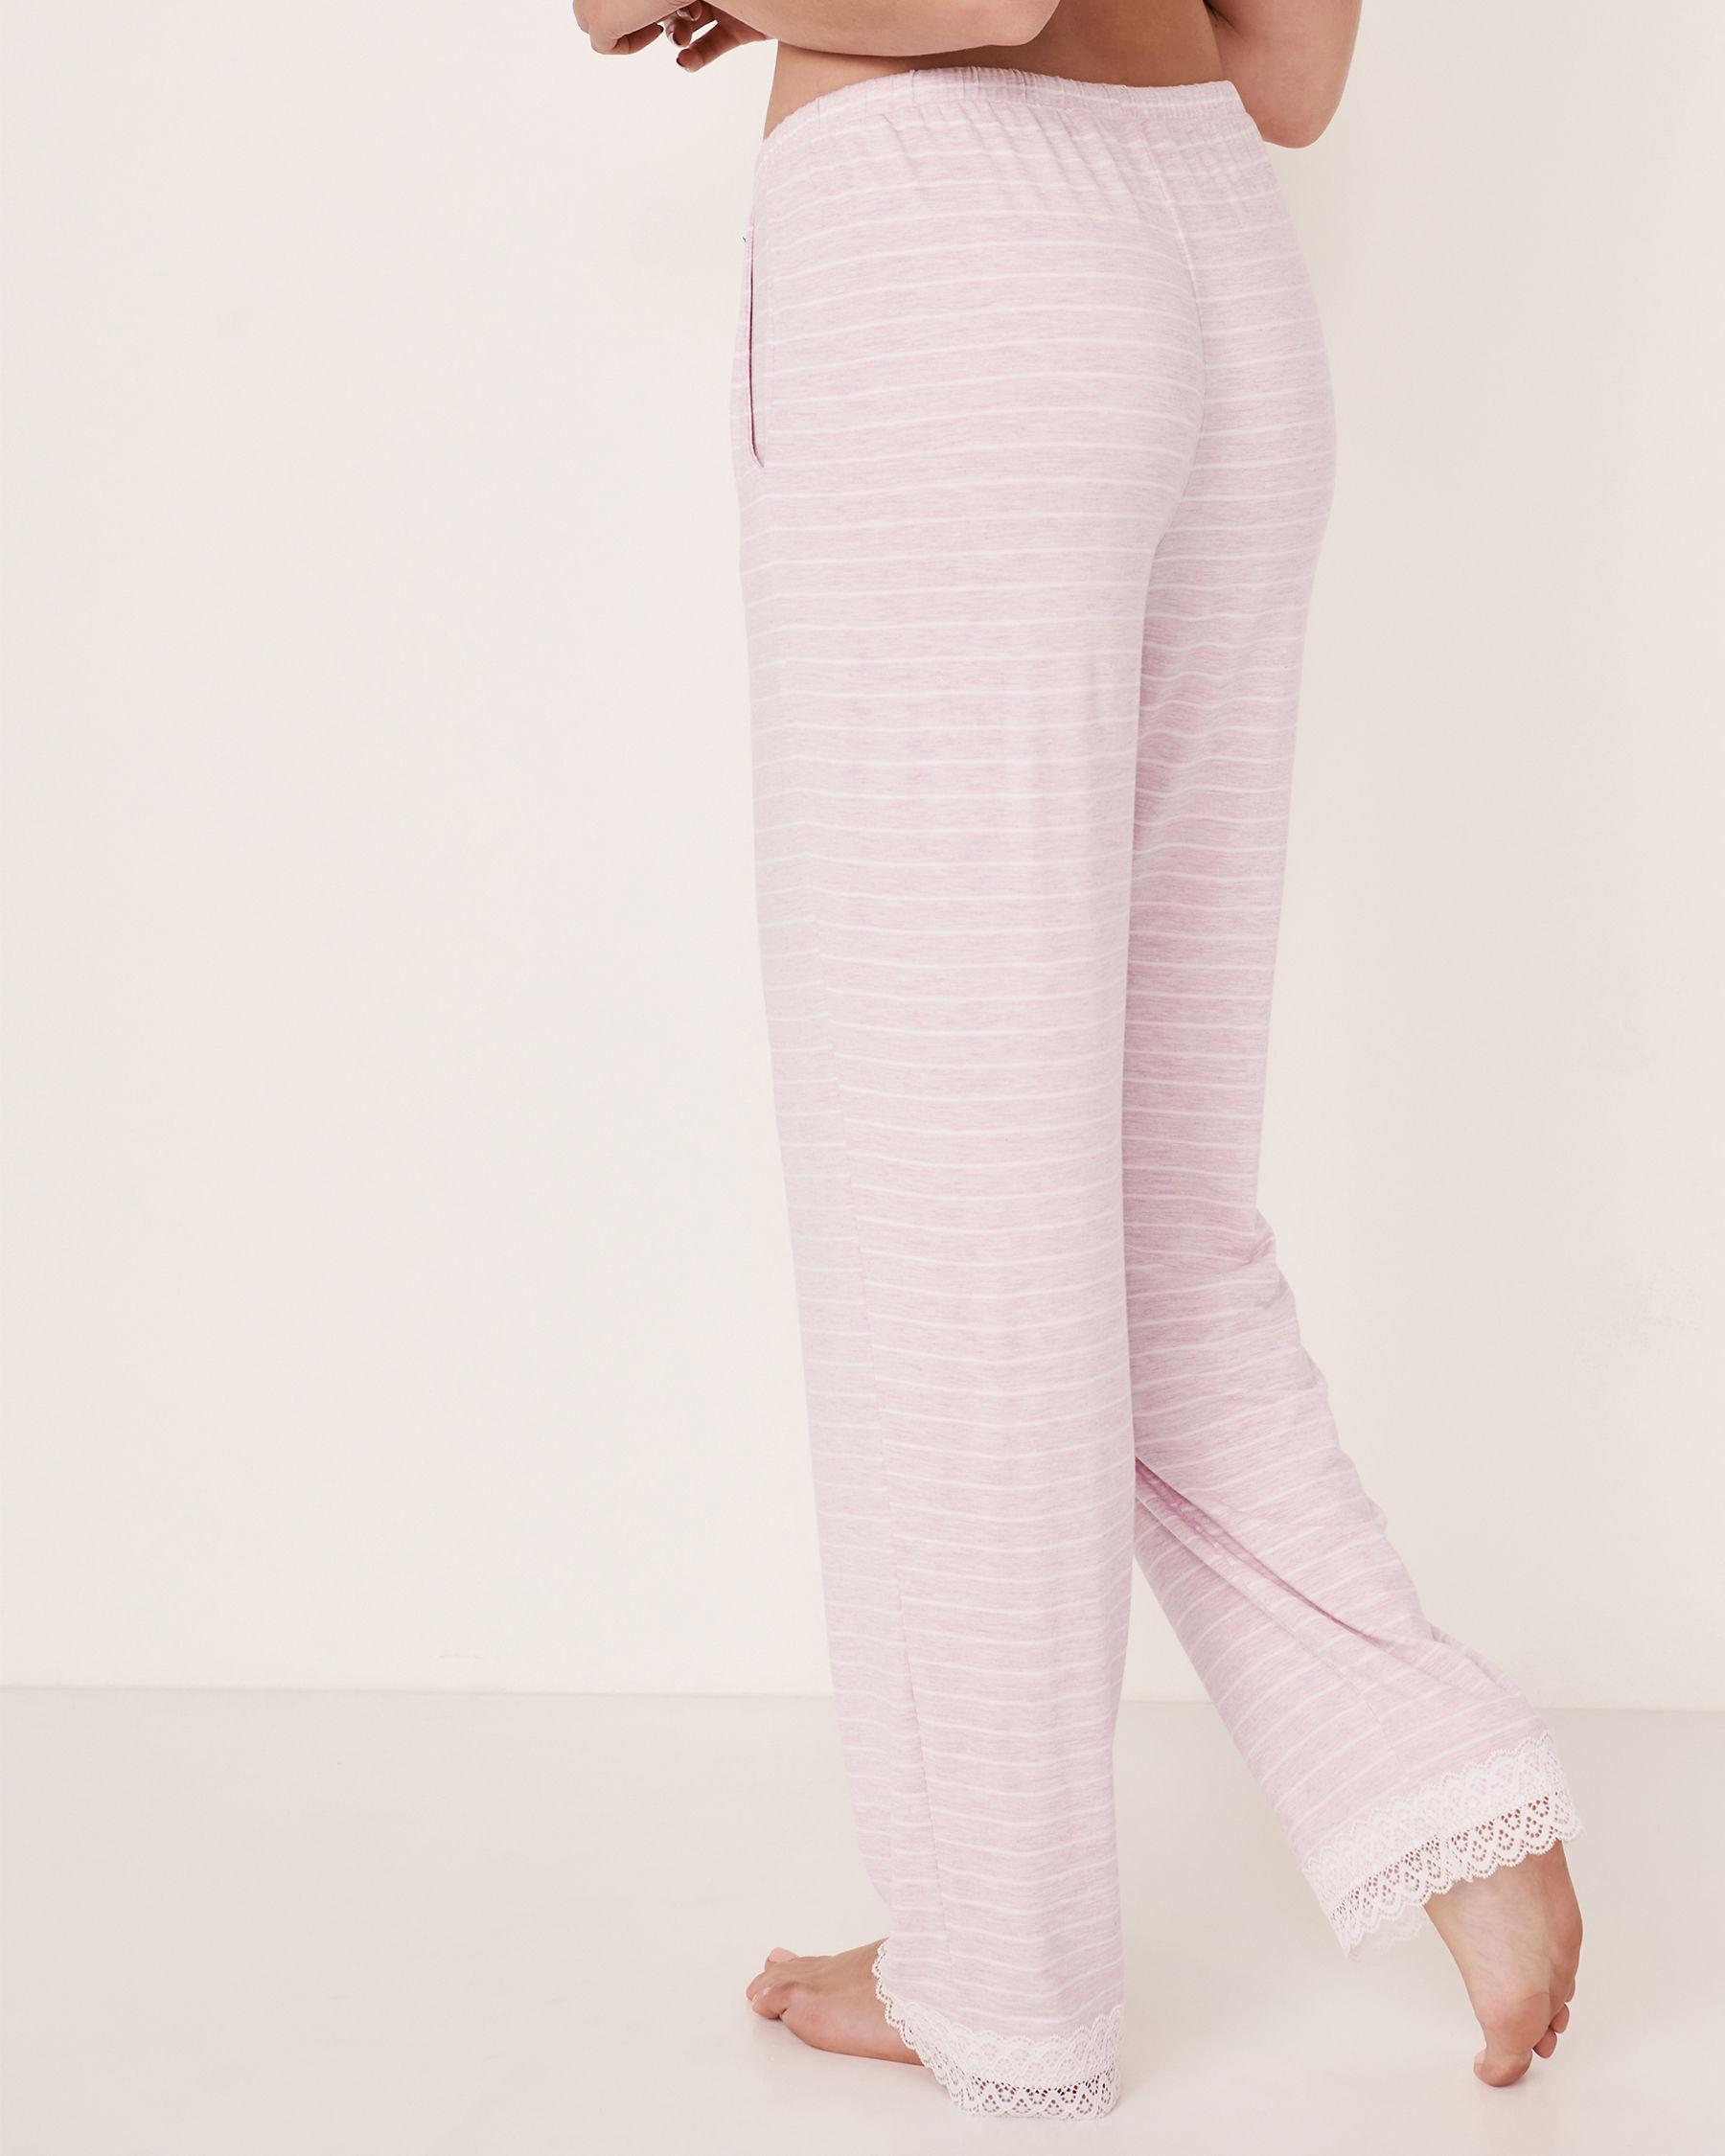 LA VIE EN ROSE Lace Trim Straight Leg Pant Stripes 50200005 - View2